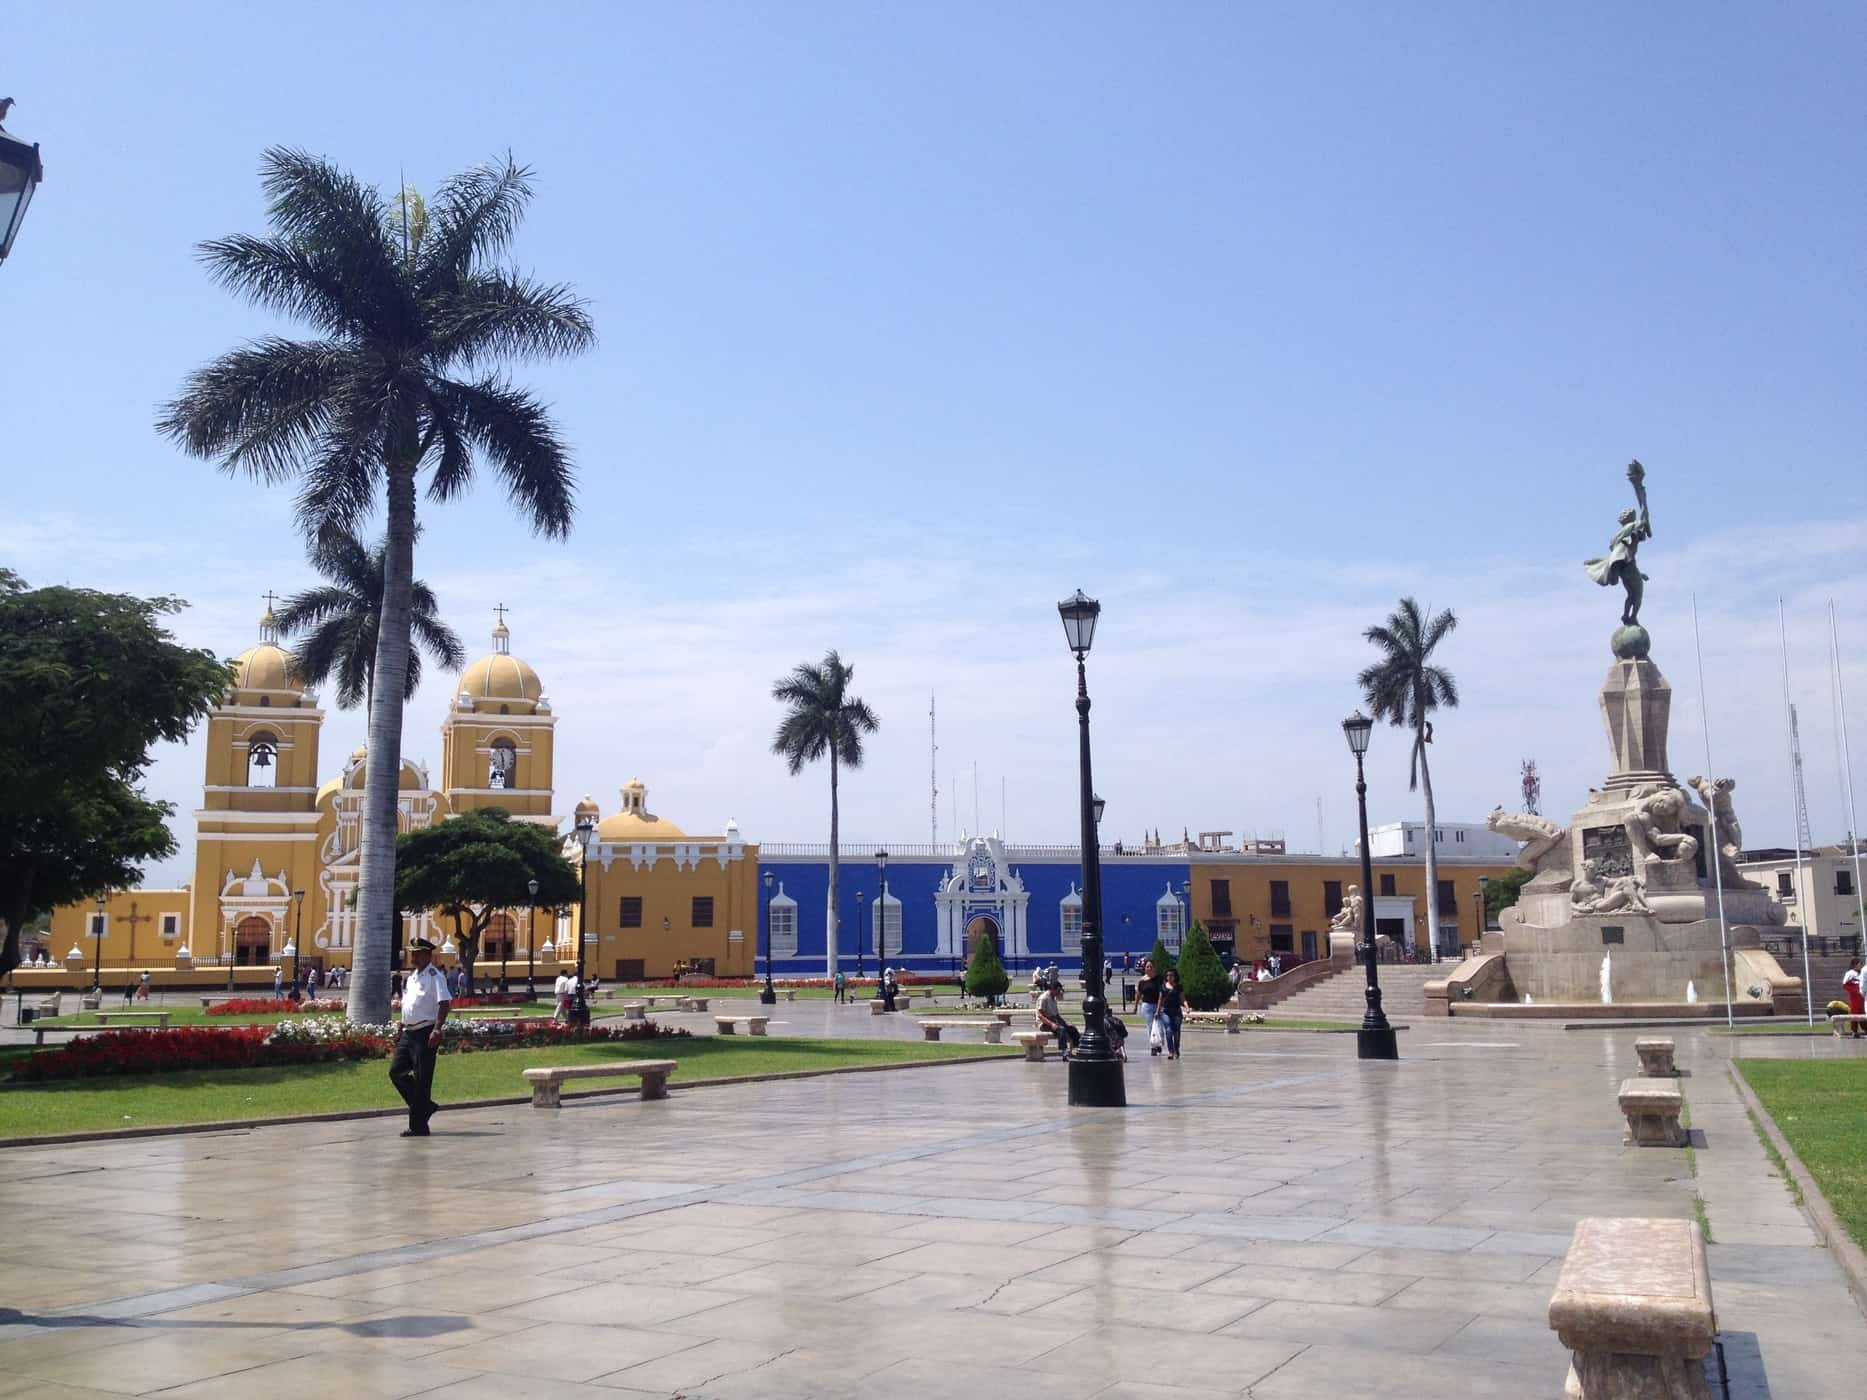 Trujillo - Plaza de Armas, Peru